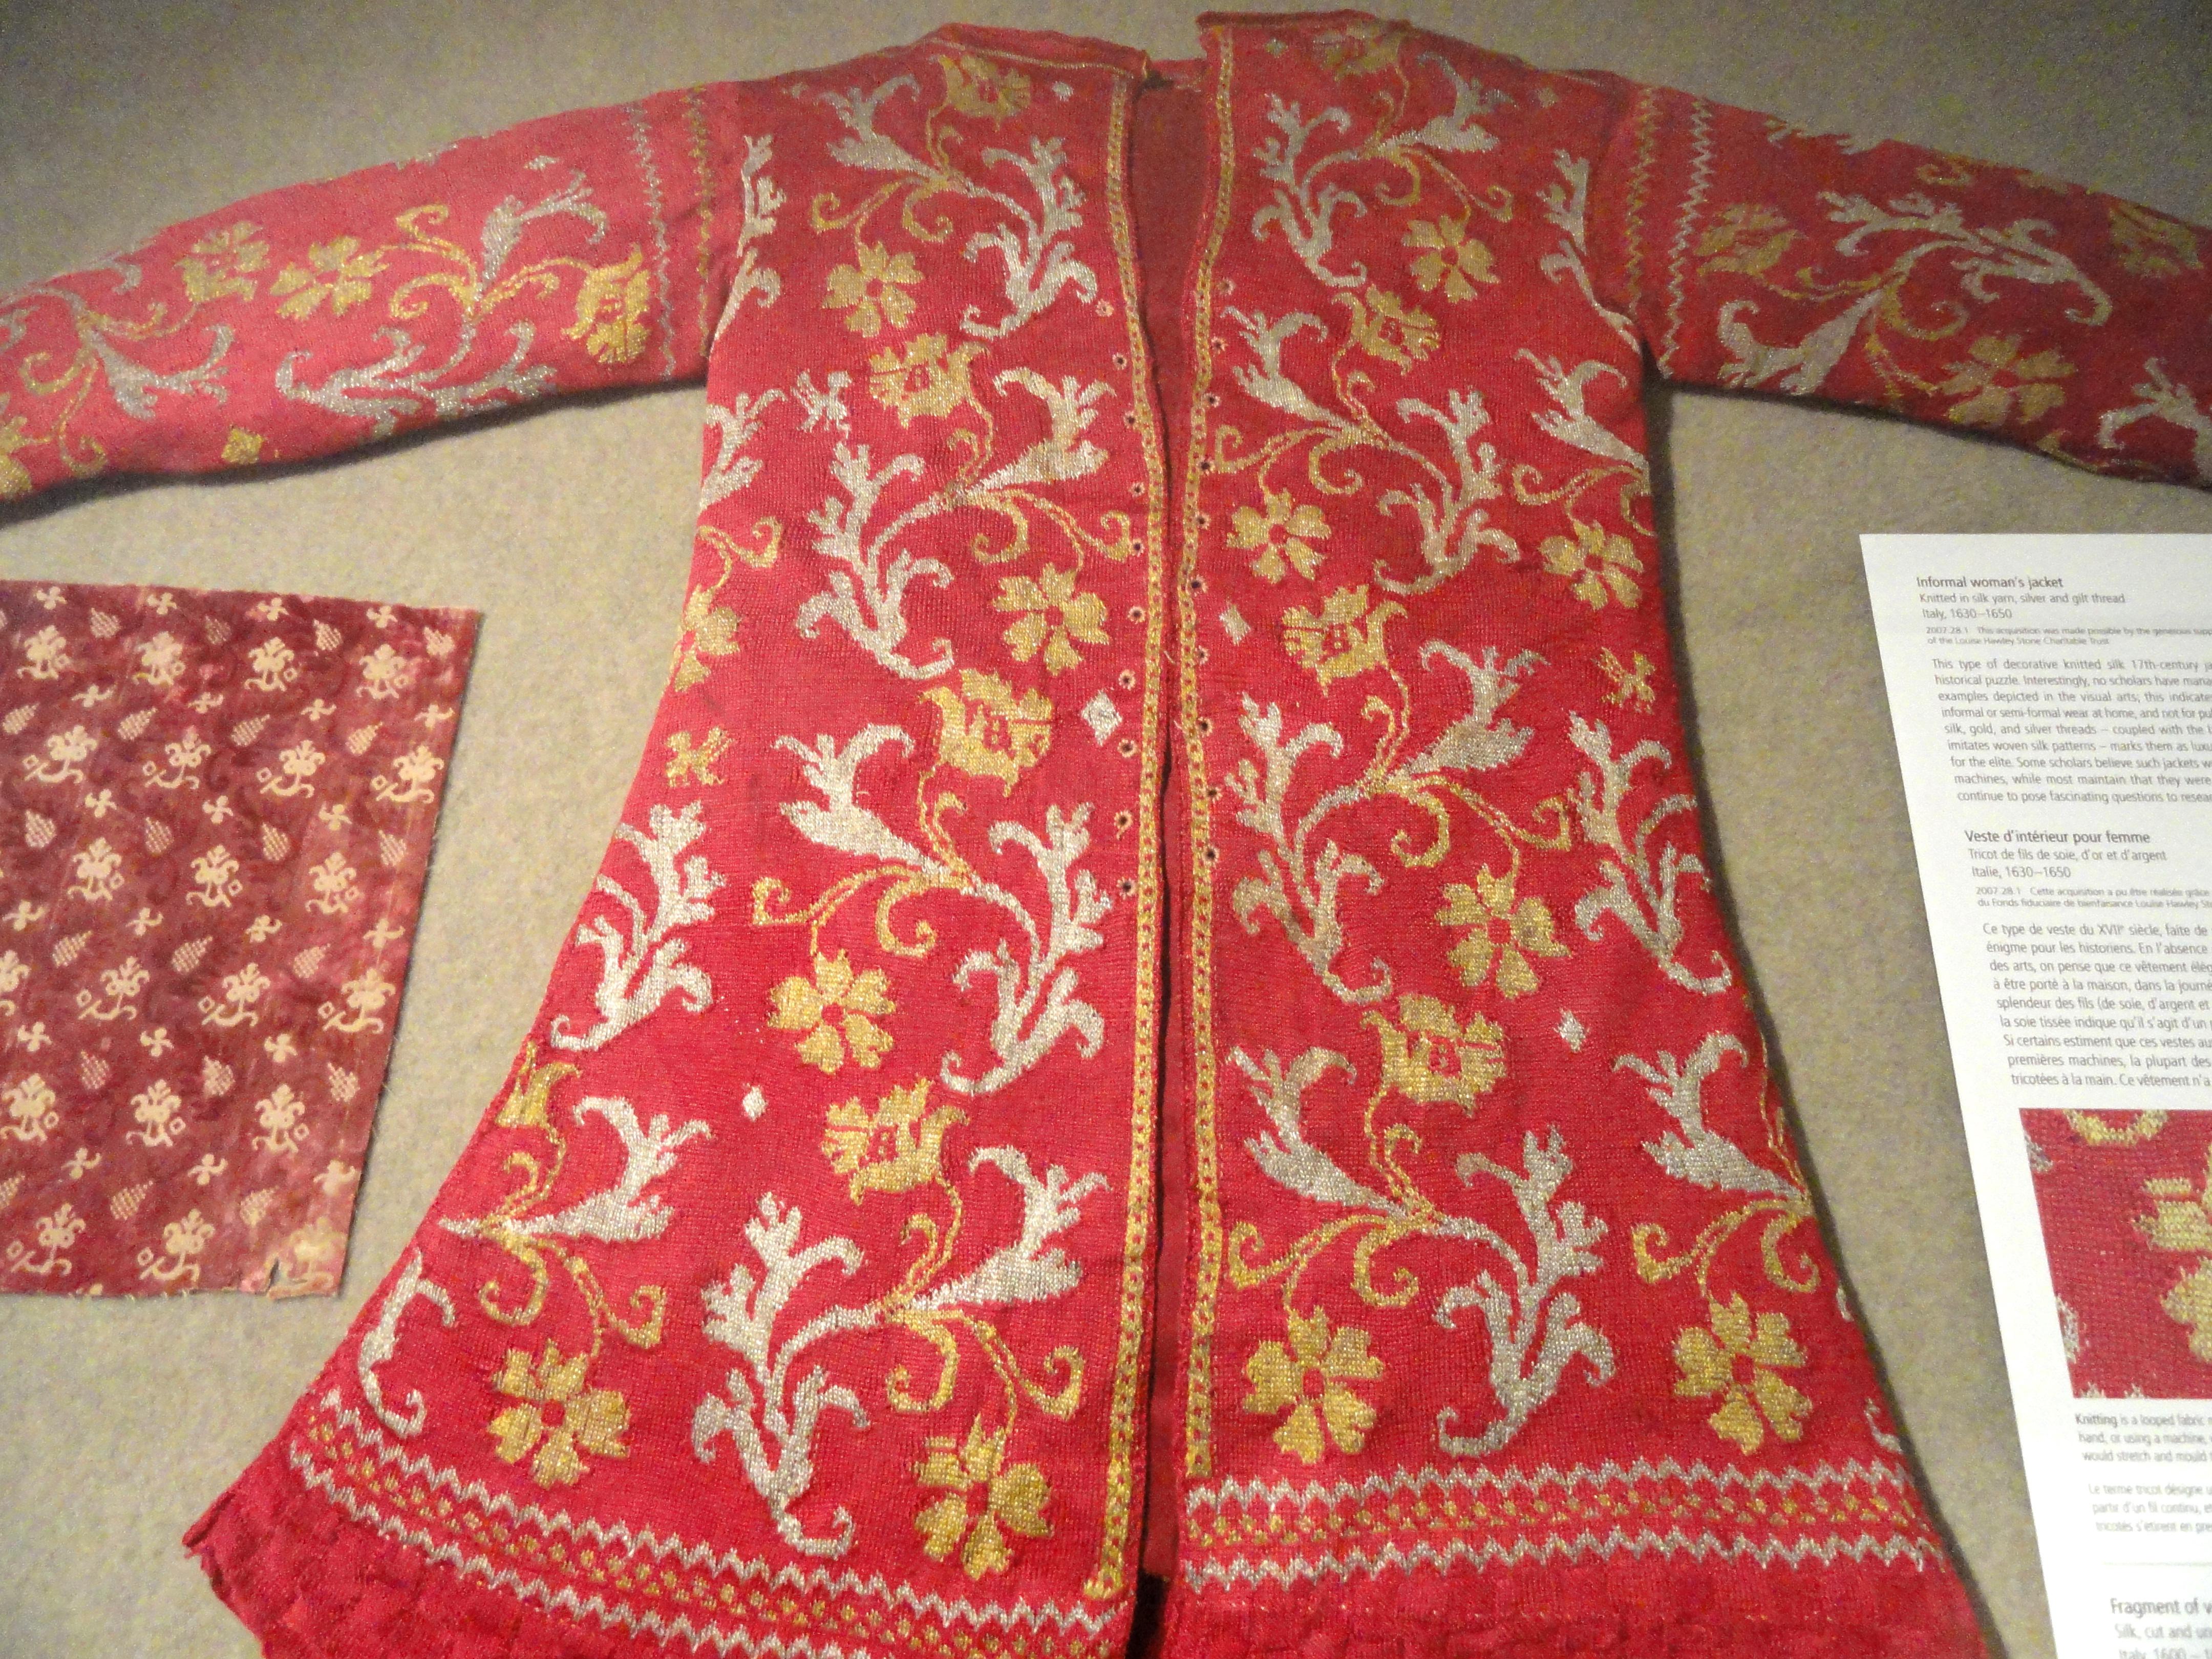 Fileinformal womans jacket italy 1630 1650 knitted silk yarn fileinformal womans jacket italy 1630 1650 knitted silk yarn bankloansurffo Gallery